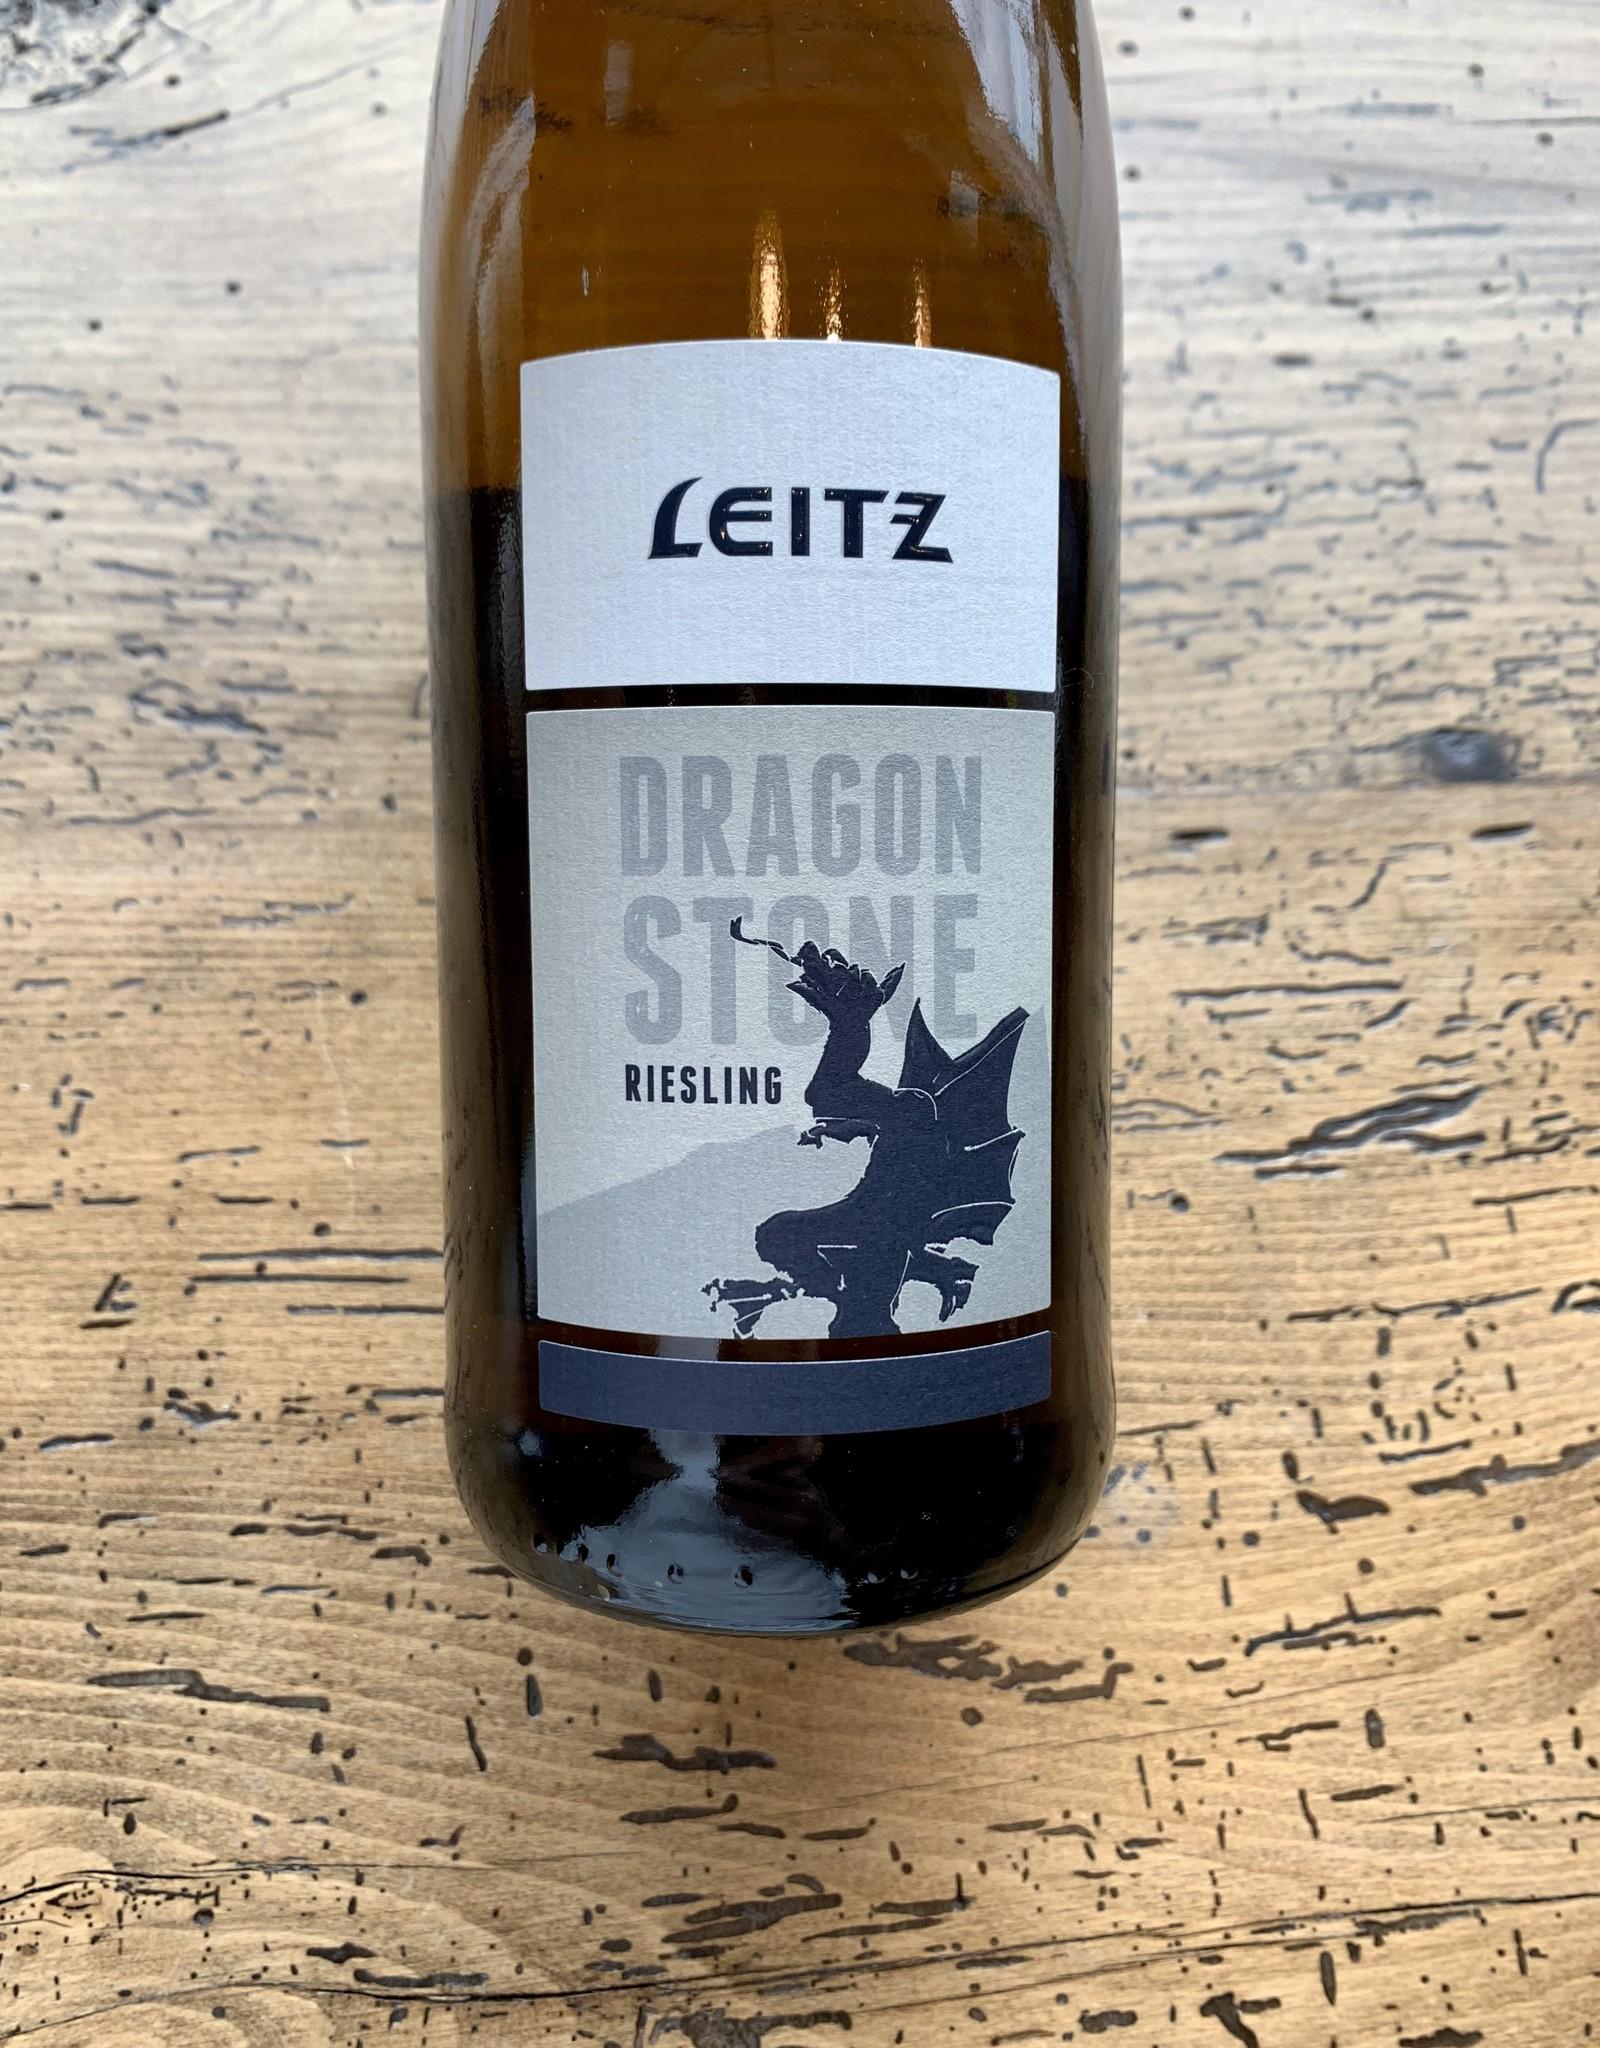 Leitz Dragonstone Riesling